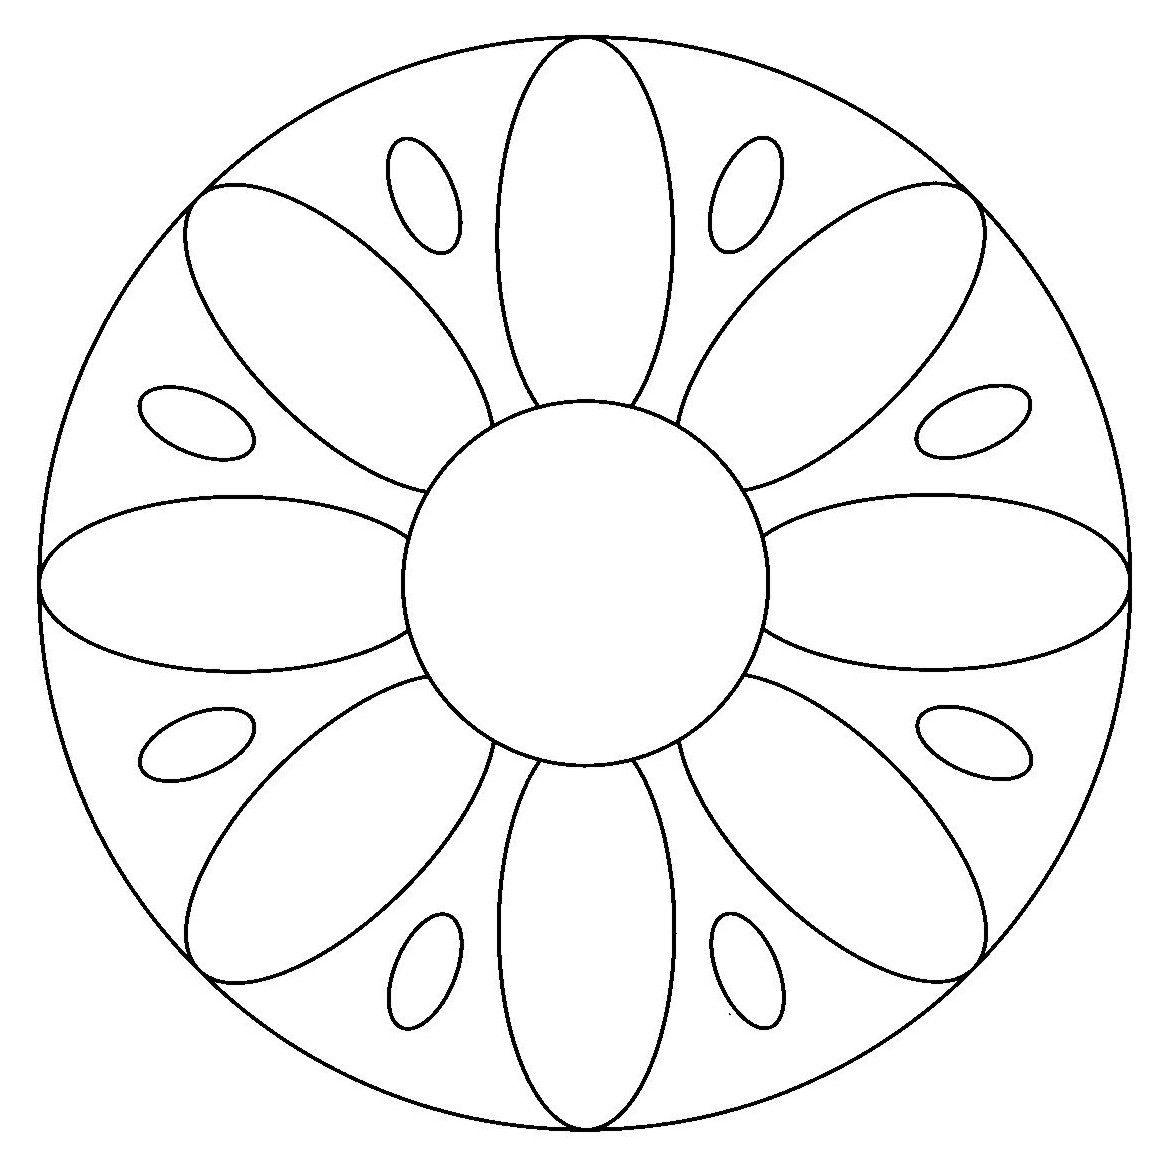 mandalas | Pintar mandalas en el ordenador   Dibujos para colorear